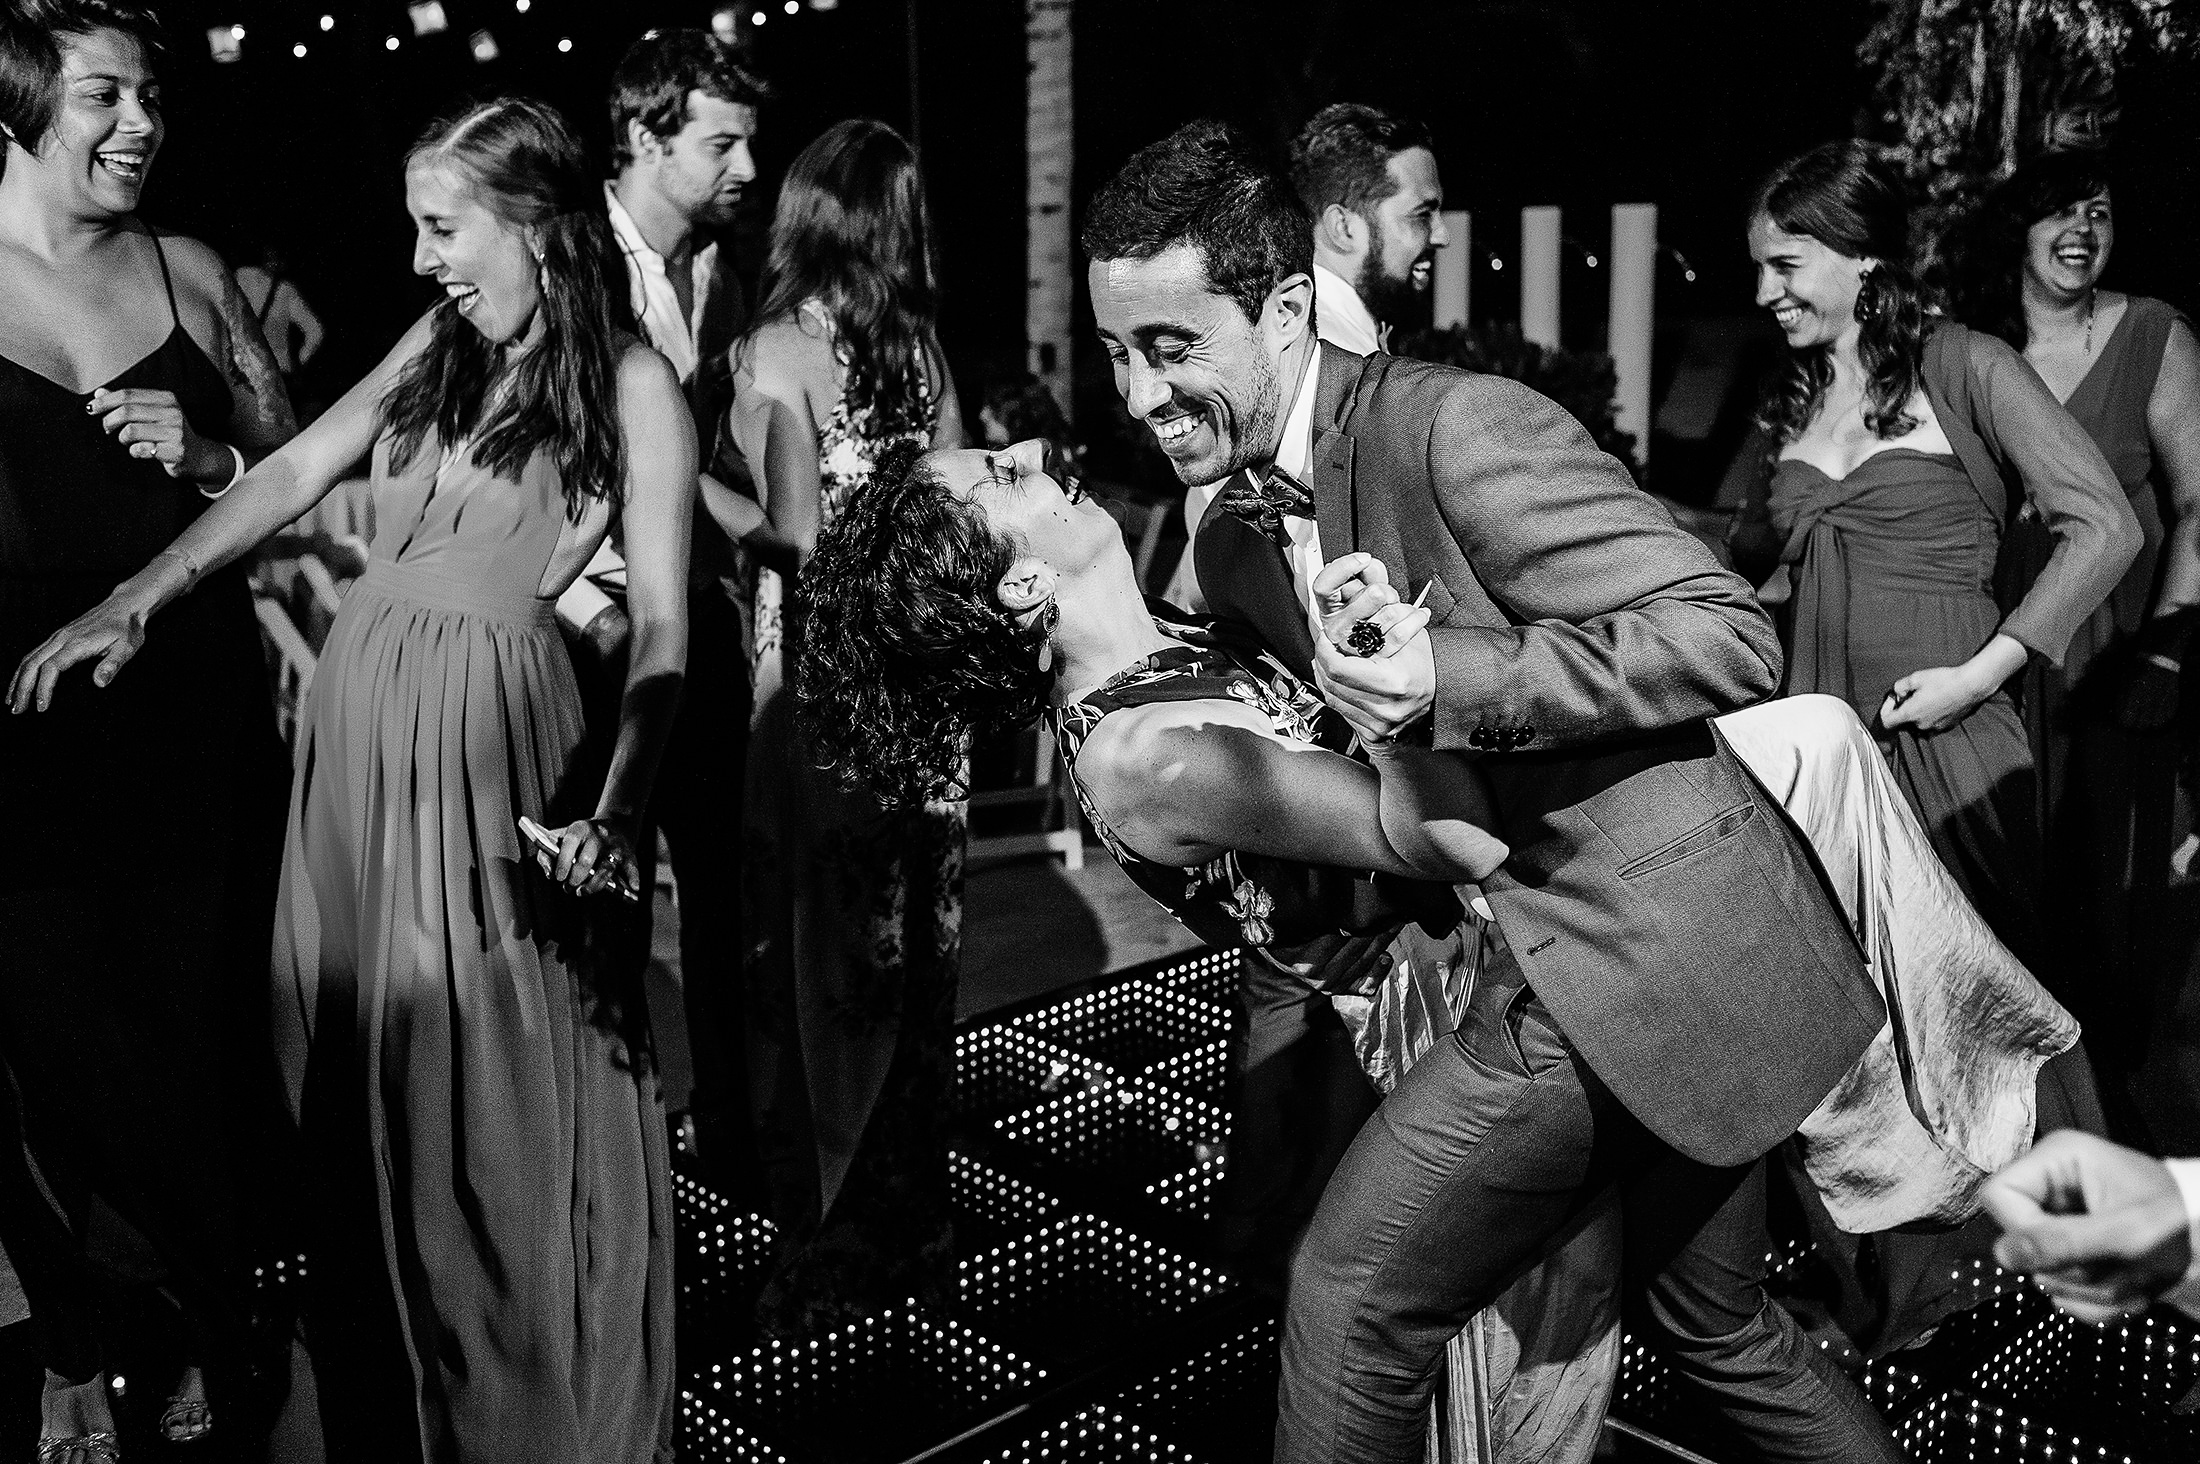 Guests dancing in wedding reception